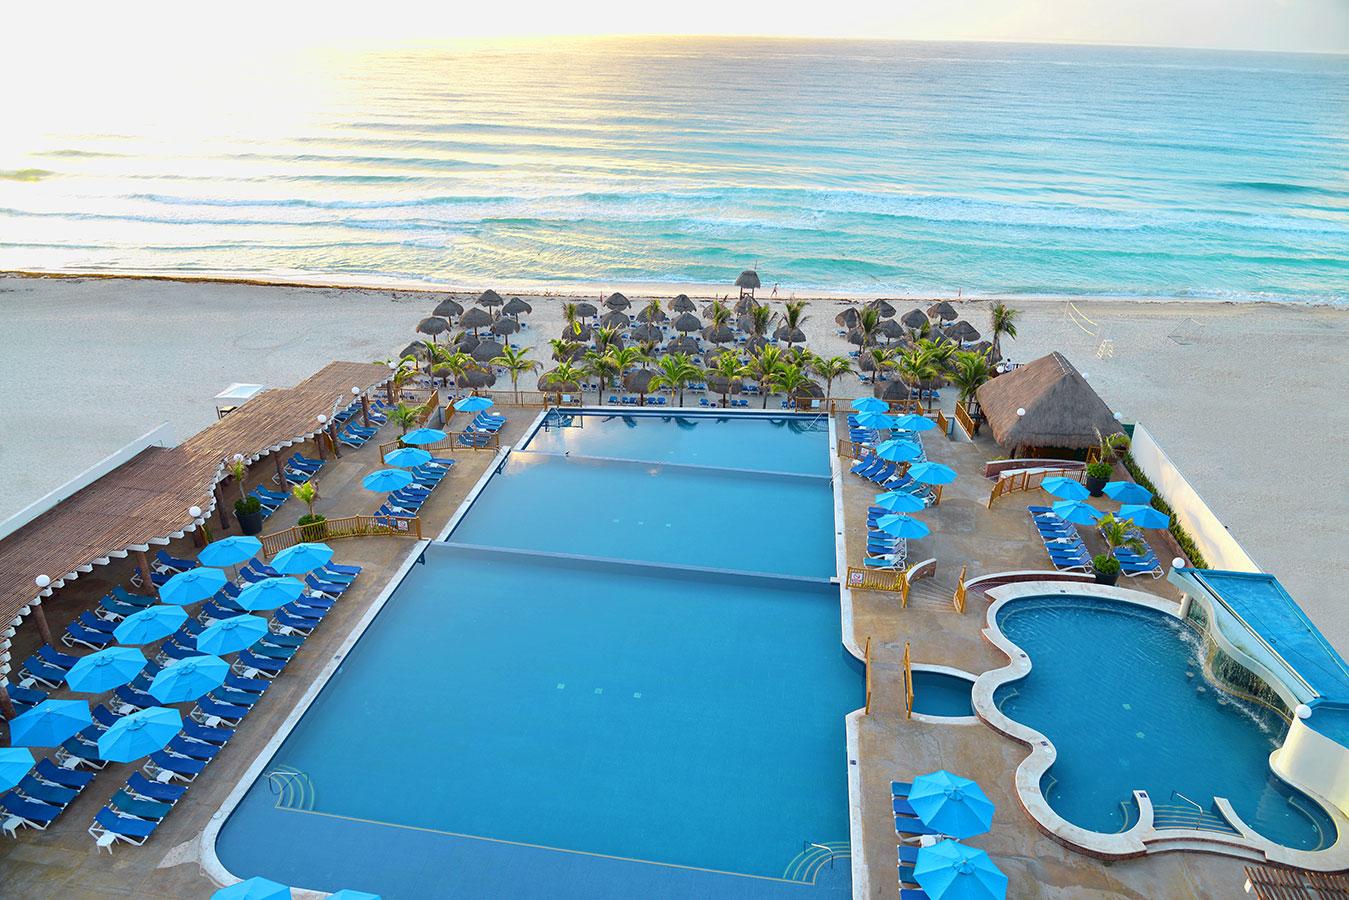 Free dating in Cancun Cancun singles